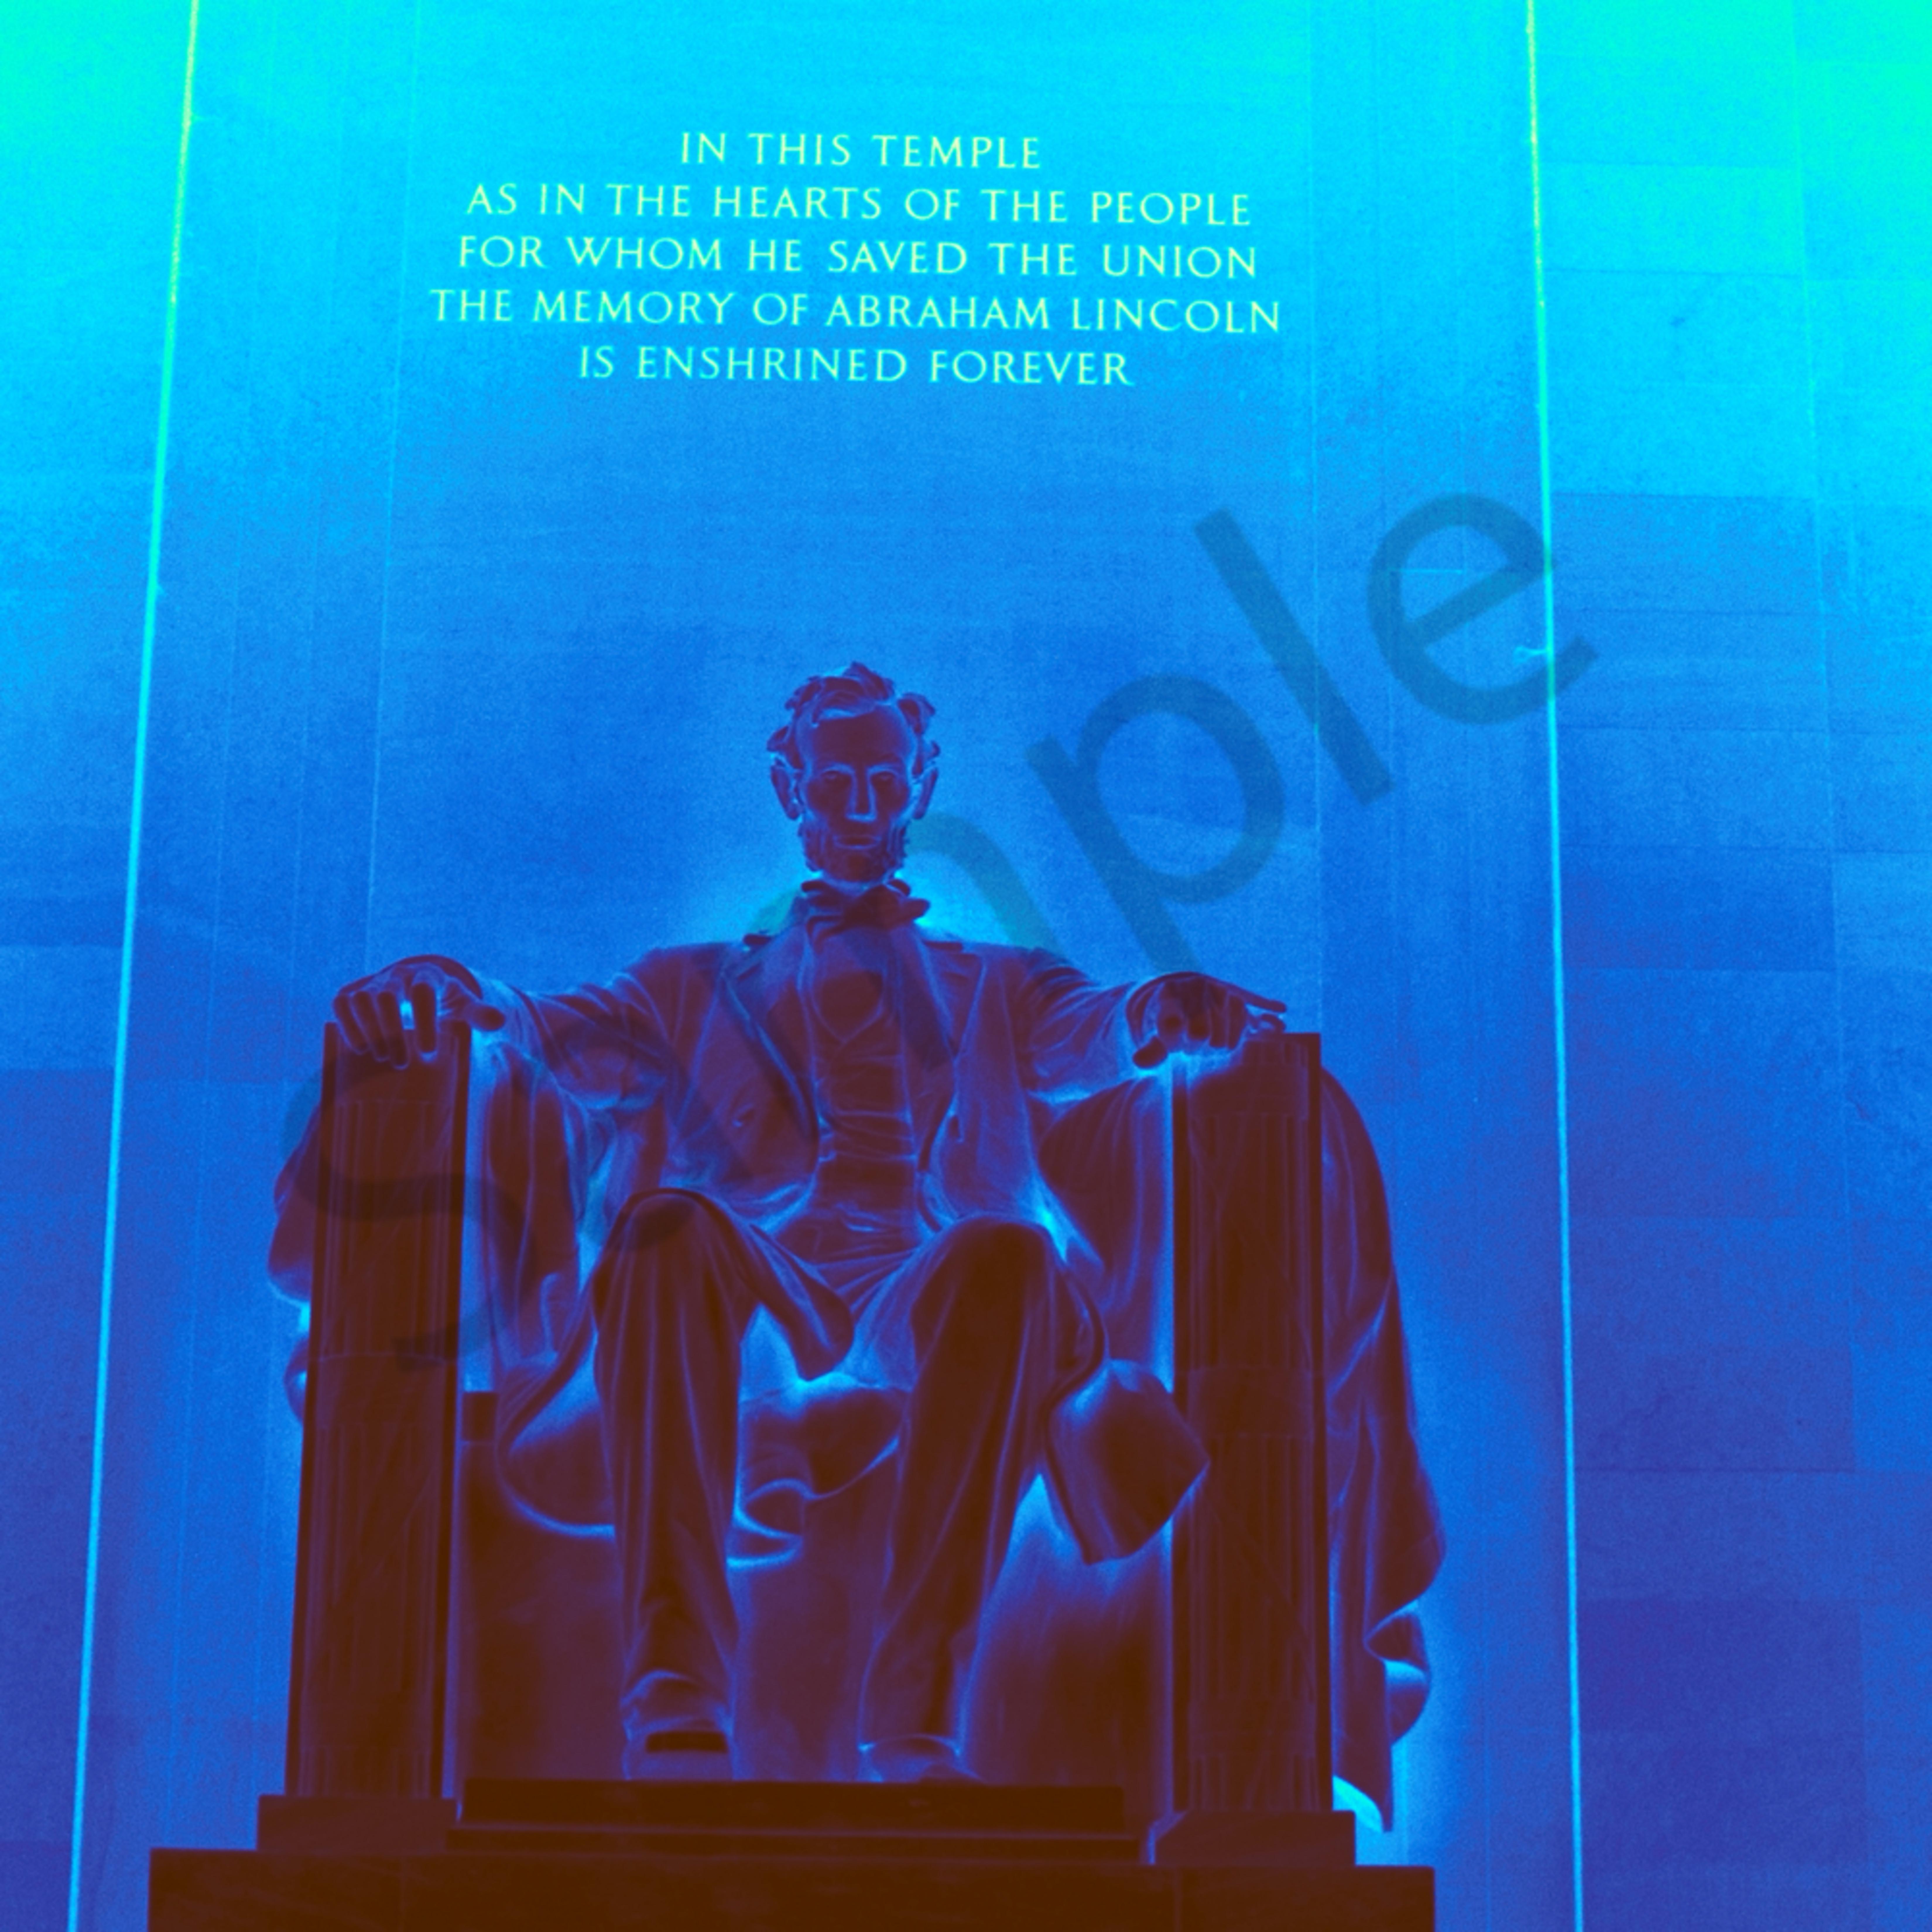 Abraham lincoln memorial g2zfgg